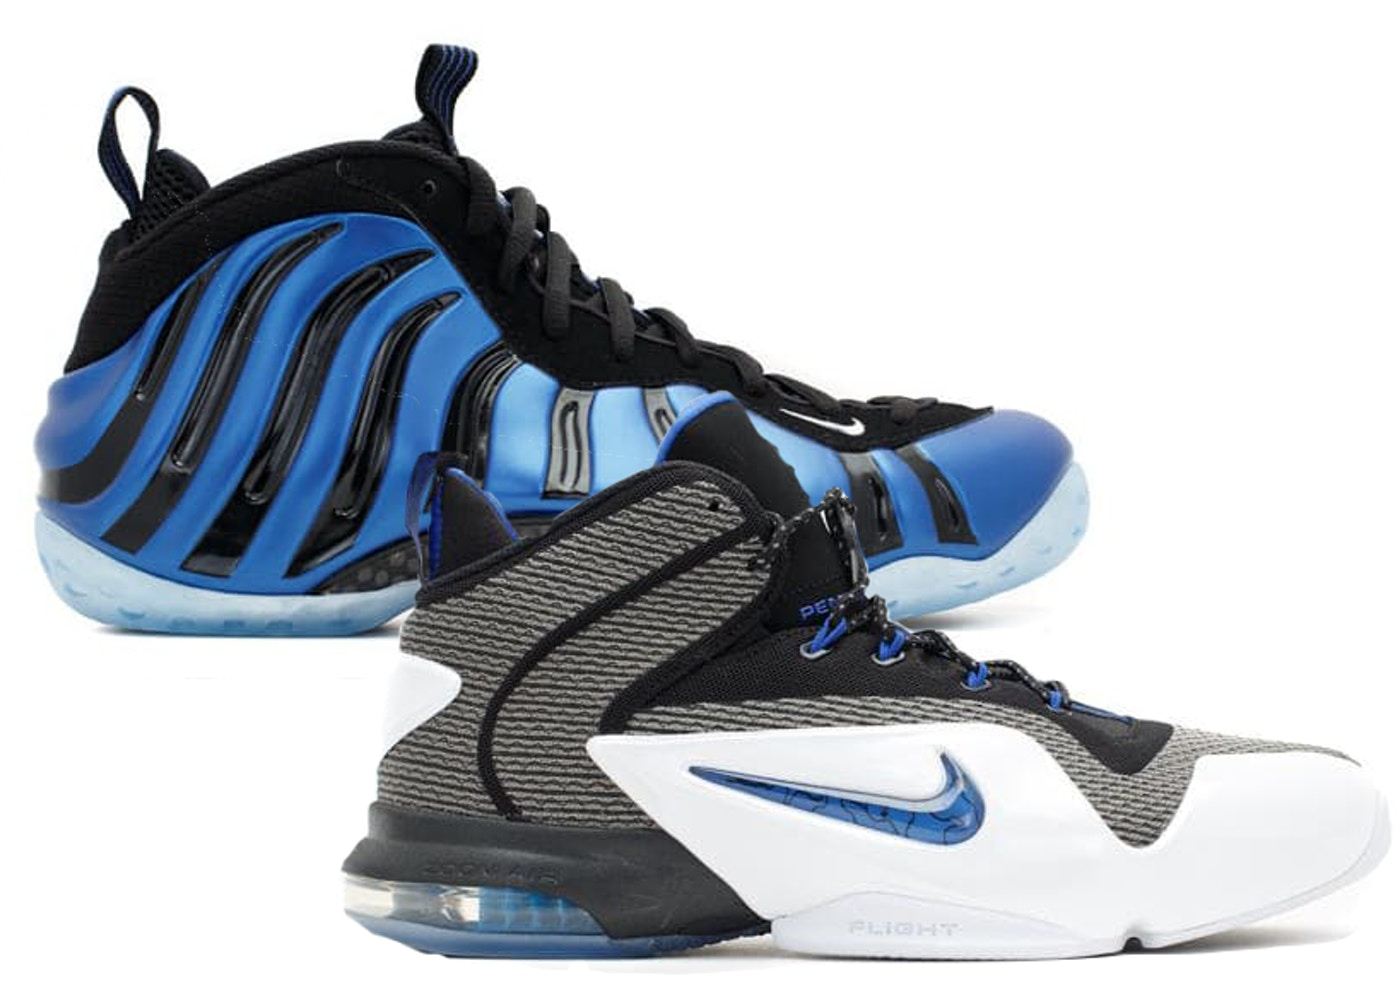 Nike Foamposite One Sharpie Pack Sneakers (Multi-Color/Multi-Color)